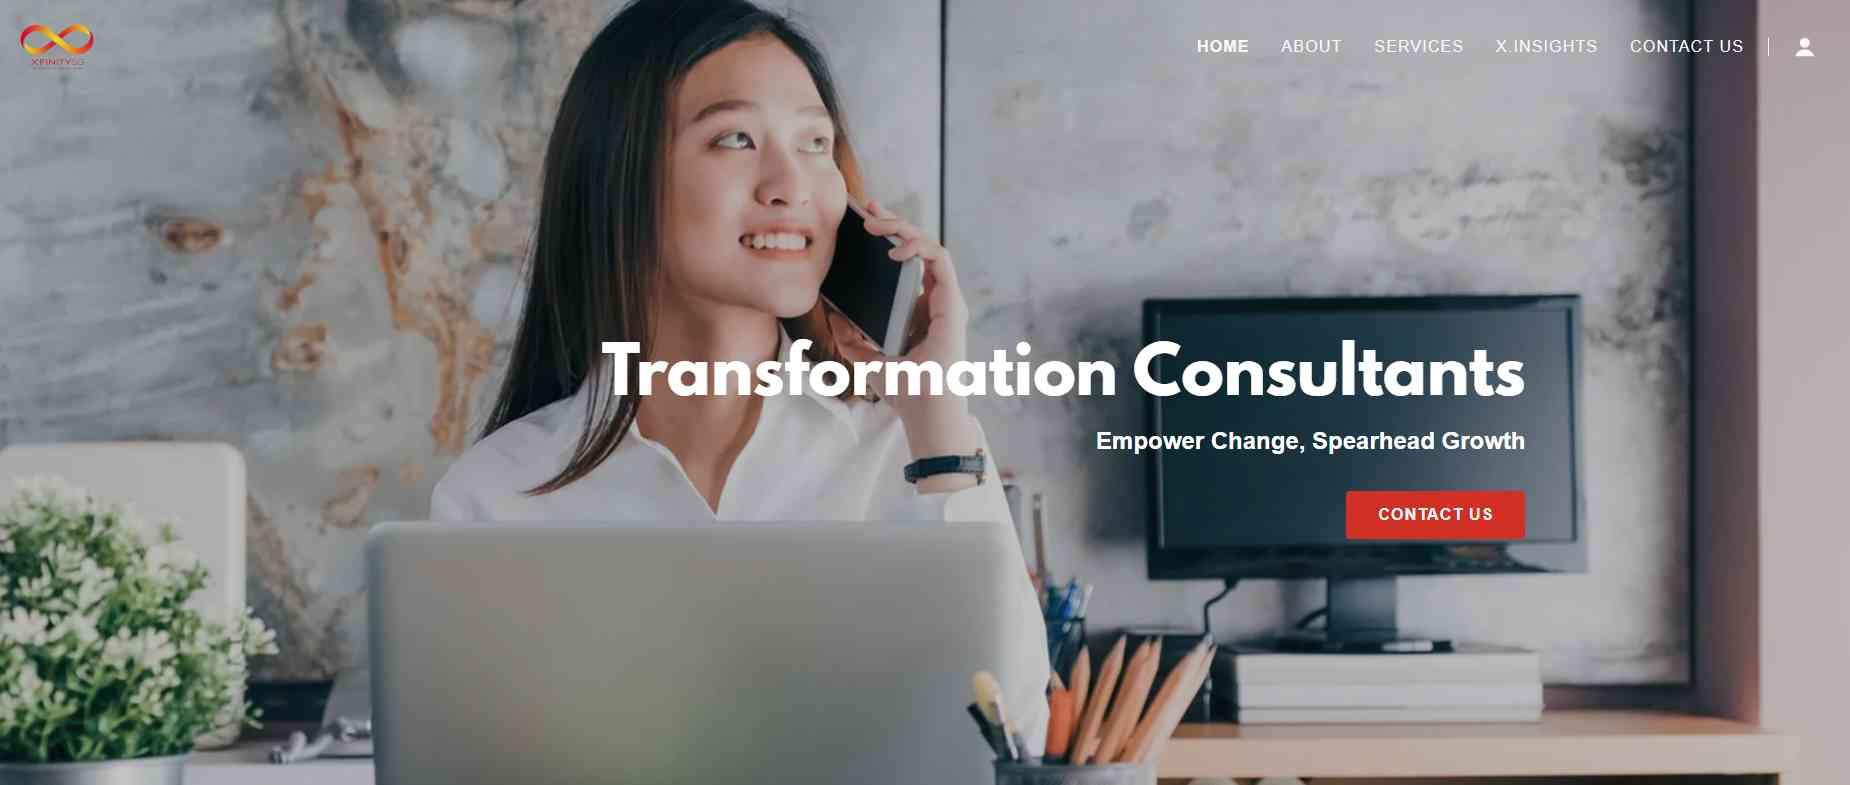 xfinity Top Digital Transformation Service Providers in Singapore